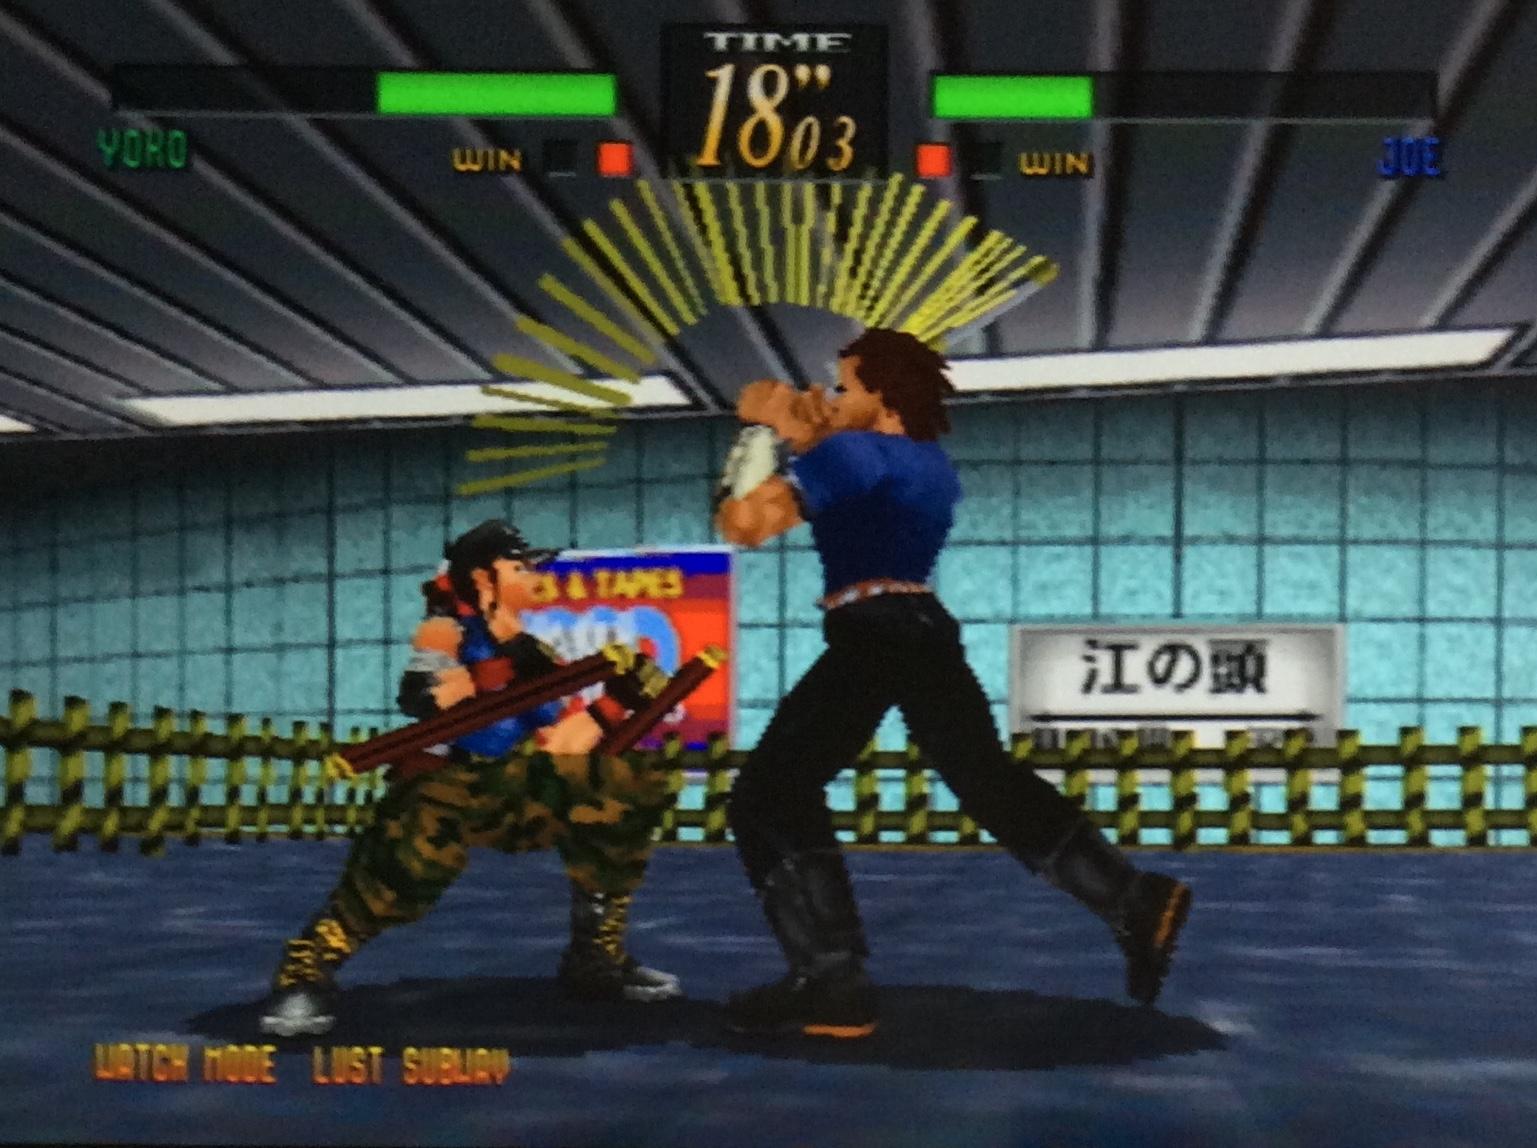 Sega Saturn Vs Playstation 1, Fight ! - Page 28 Fullsizeoutput_4f9